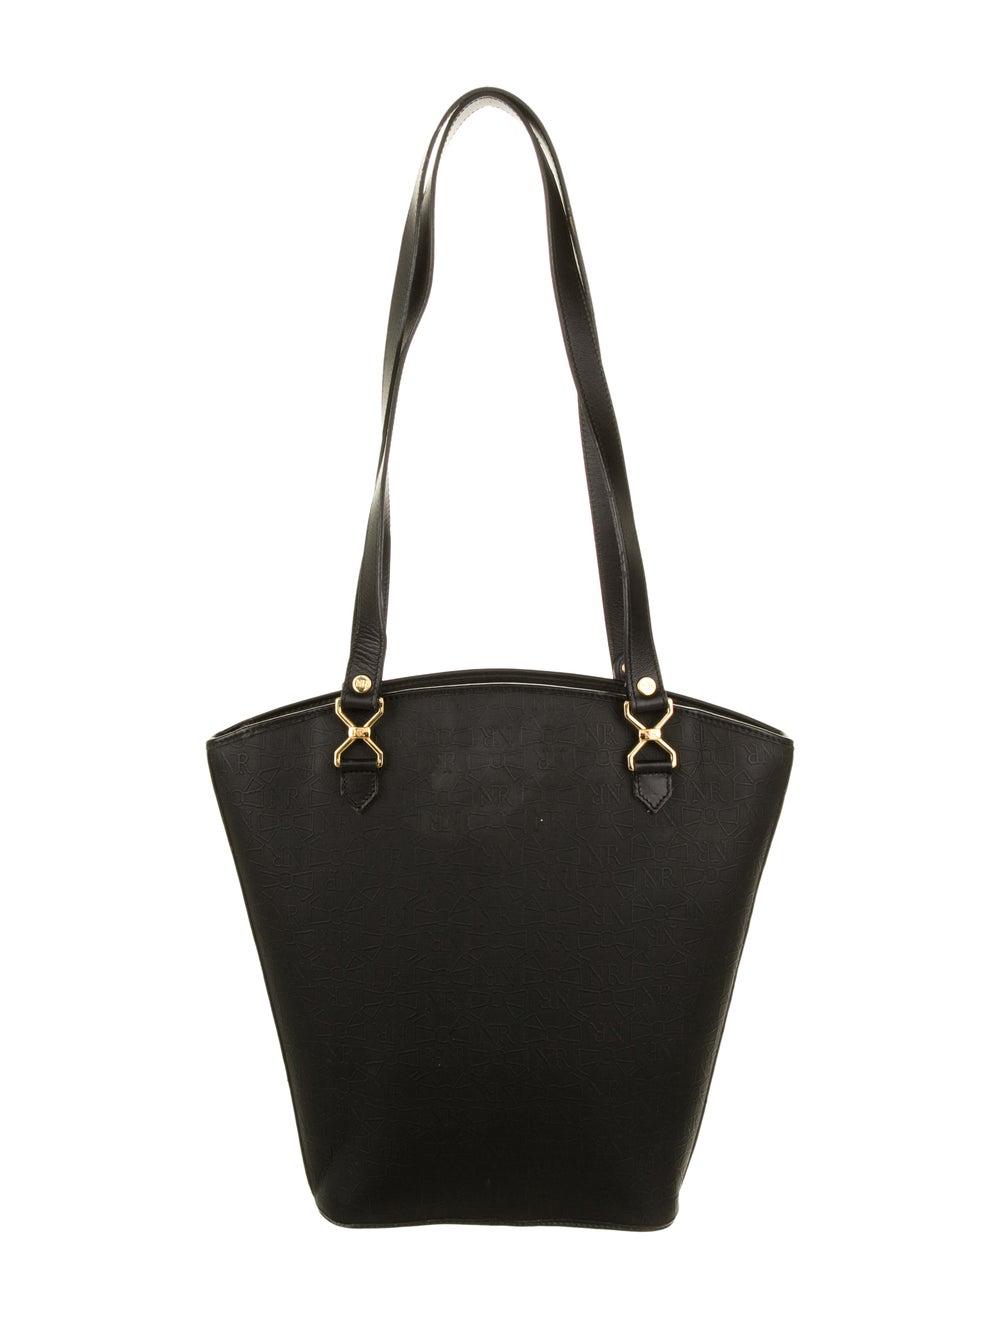 Nina Ricci Leather Handle Bag Black - image 4